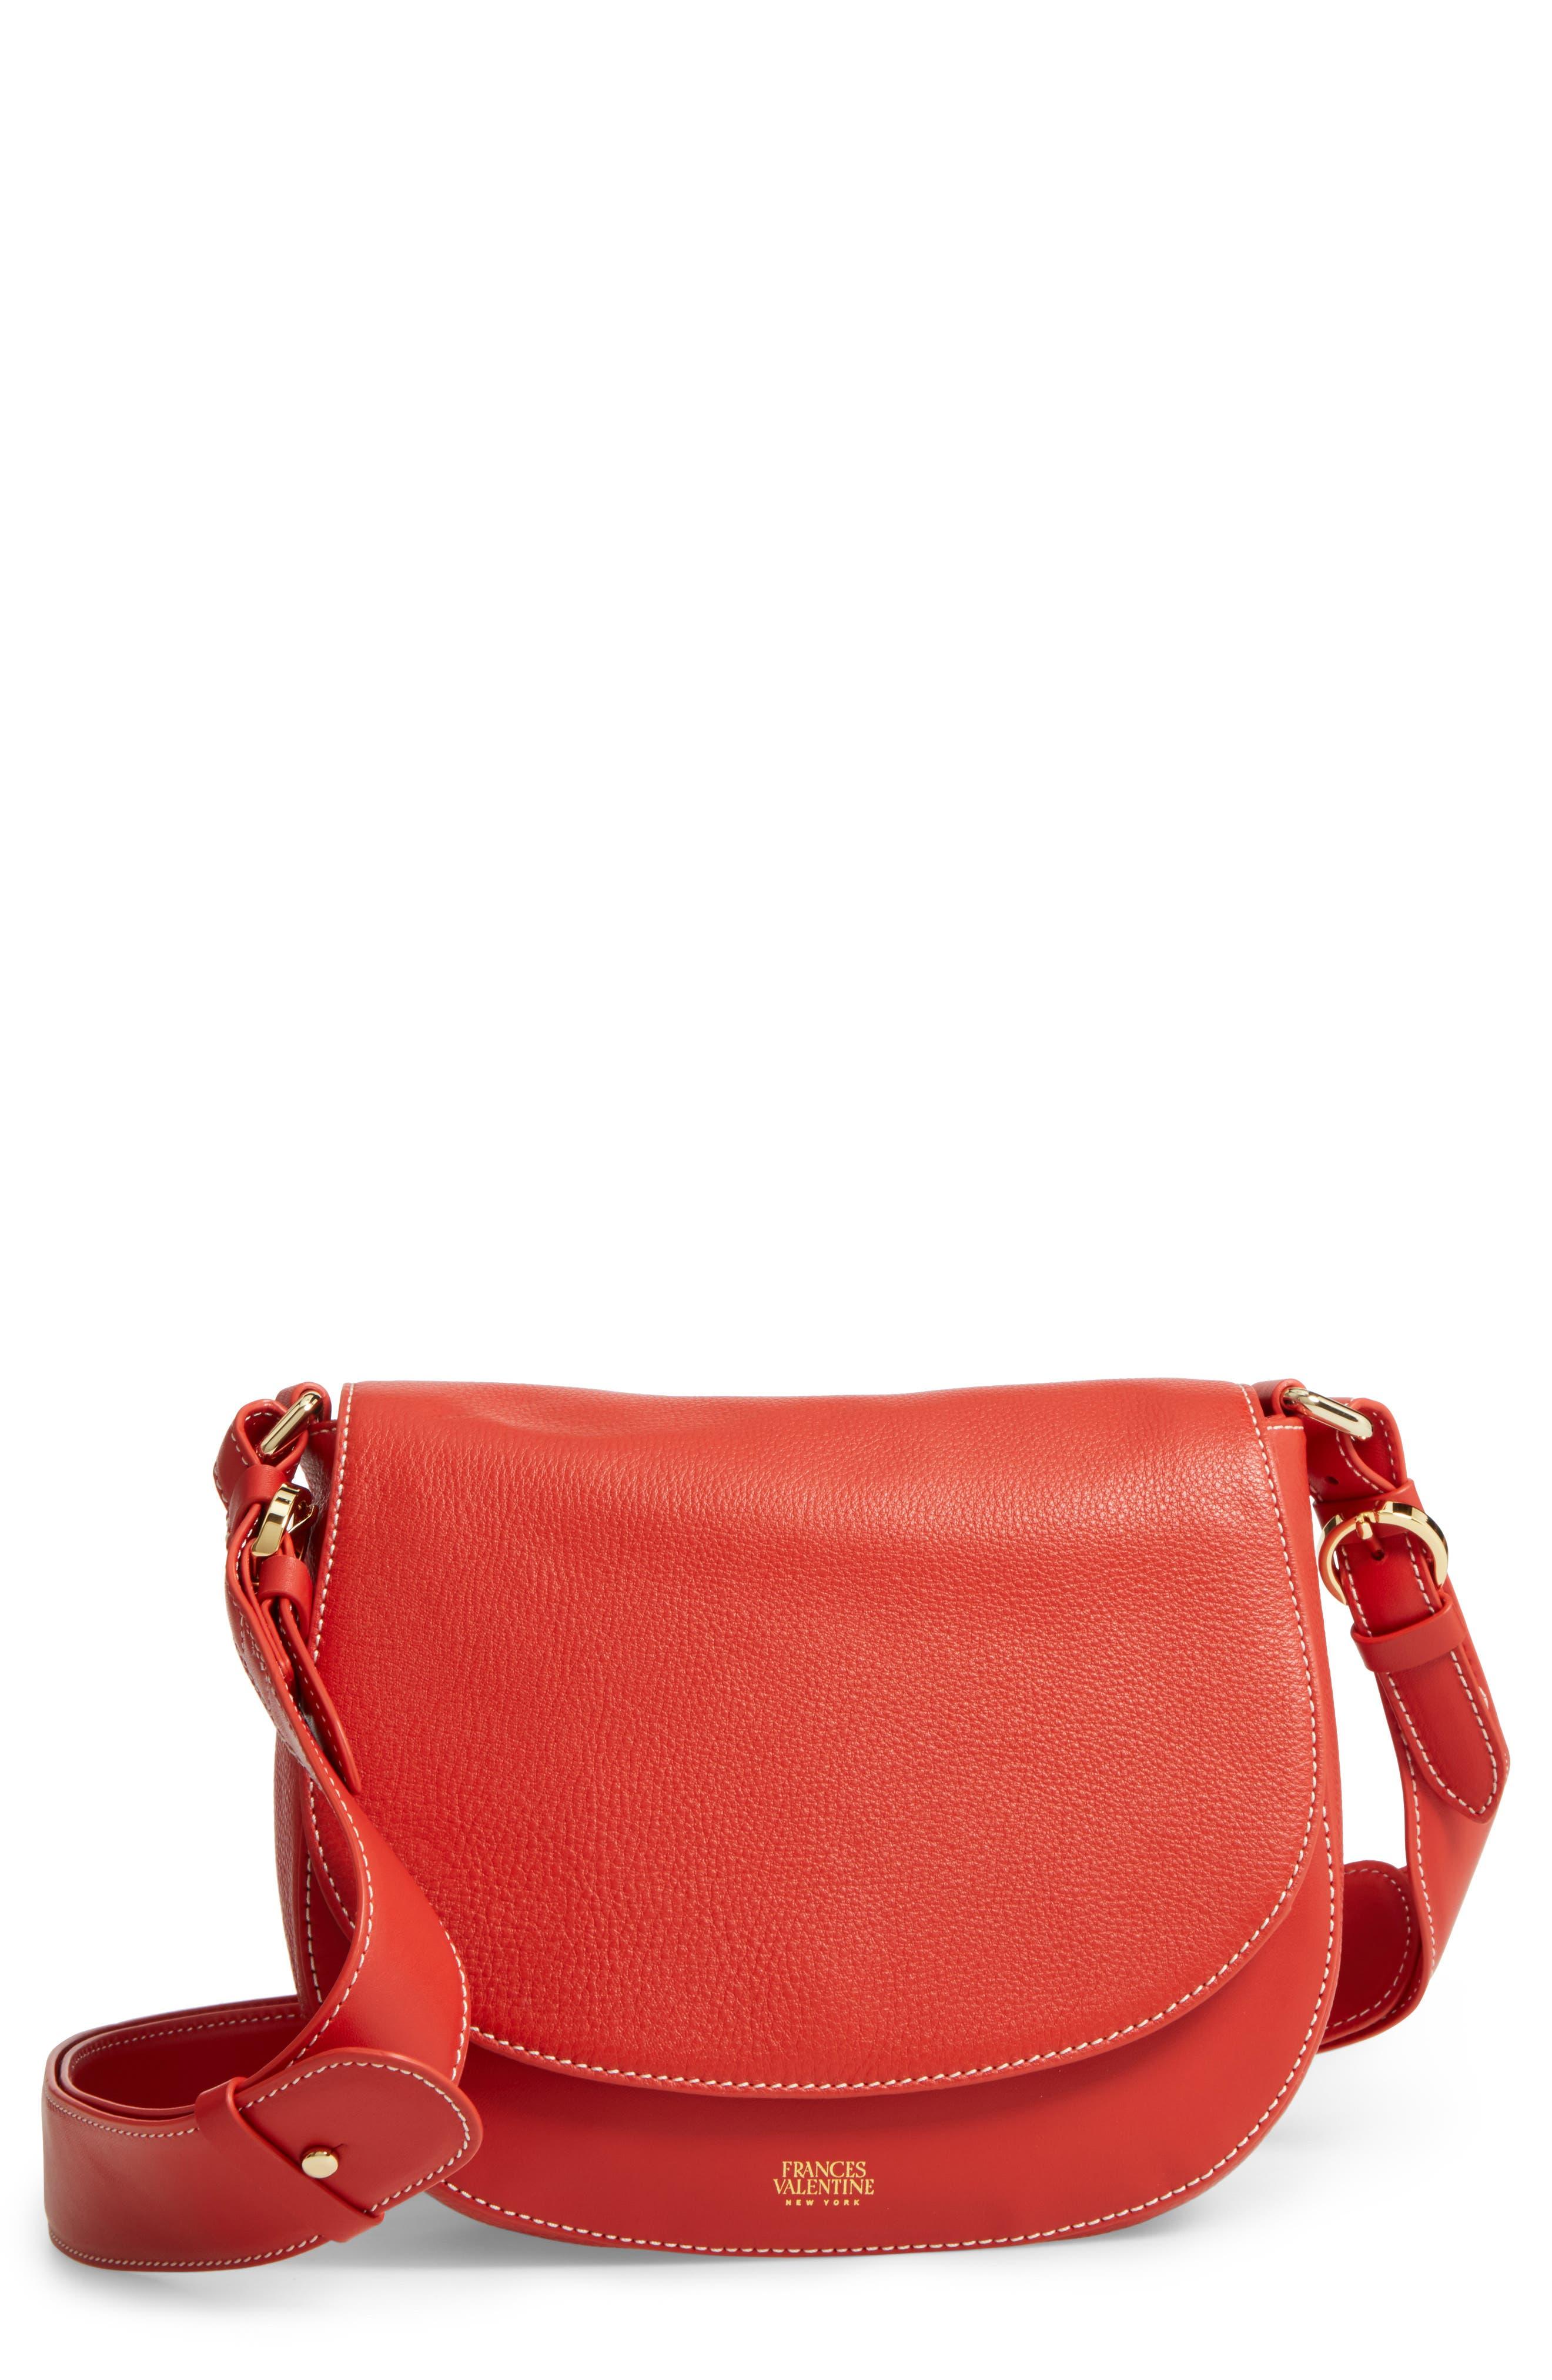 FRANCES VALENTINE Small Ellen Leather Crossbody Bag